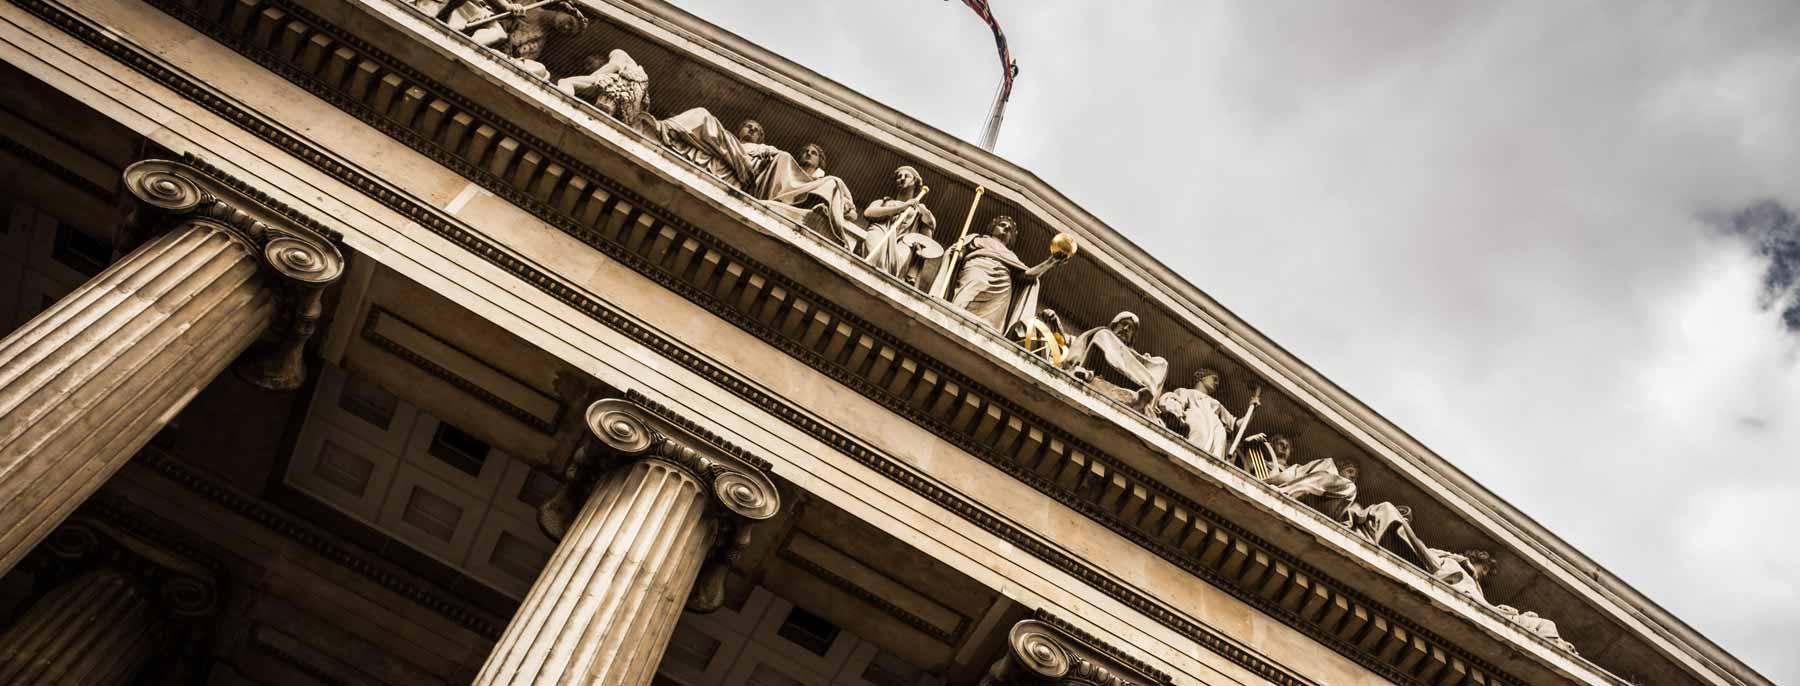 an historic law building exterior detail